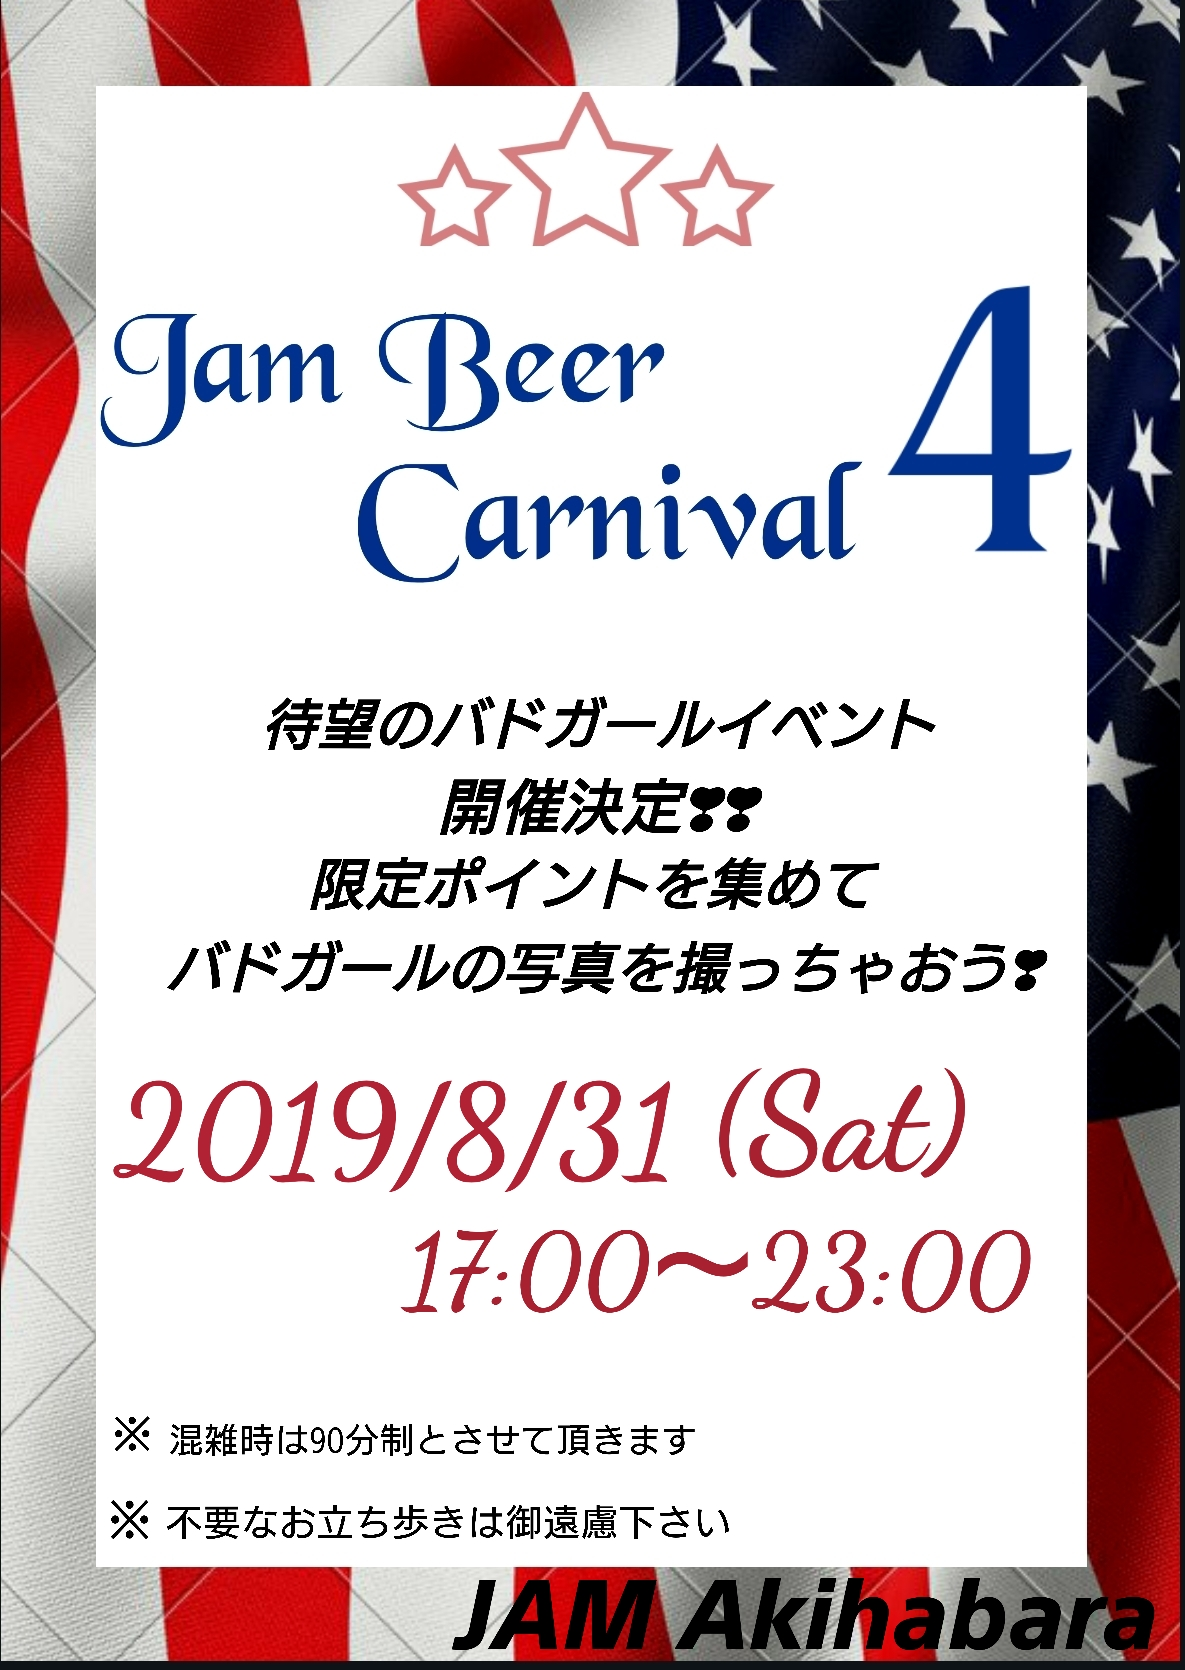 Jam Beer Carnival 4